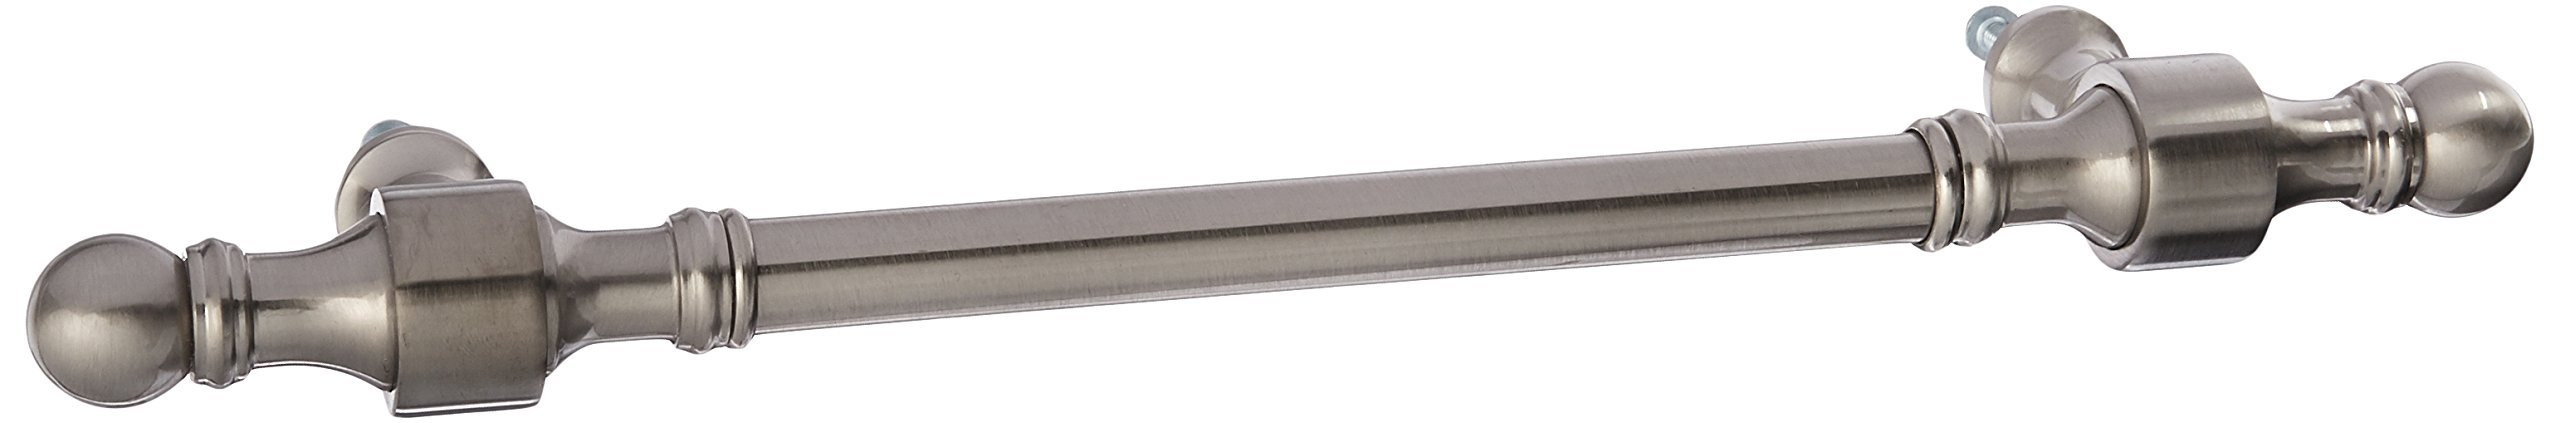 Allied Brass RW-3/8-SN Retro Wave Collection Smooth Refrigerator Pull, 8'', Satin Nickel